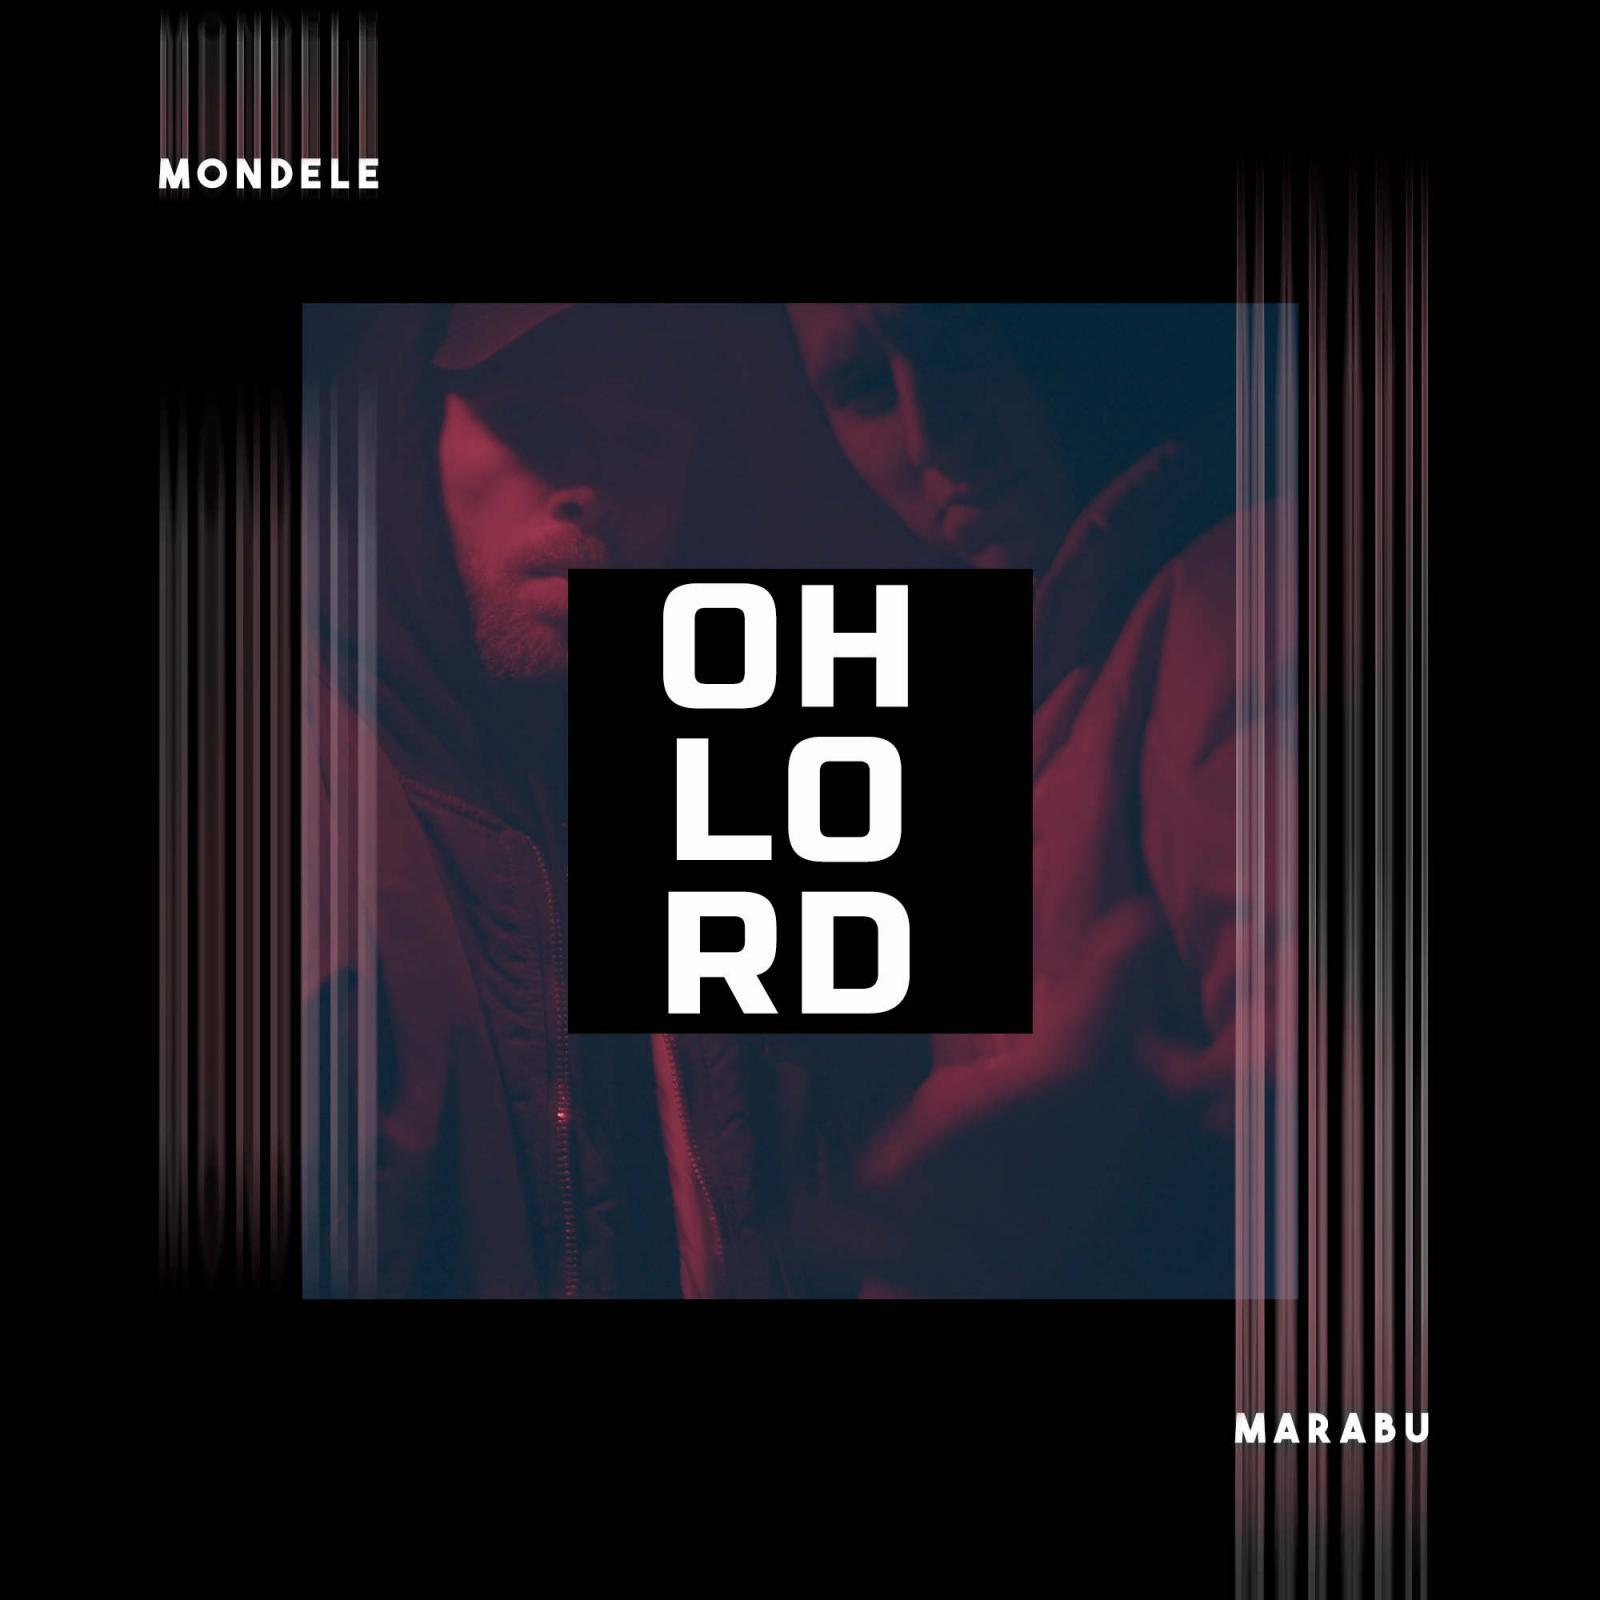 Upcoming: Marabu - Oh Lord (feat. Mondele)